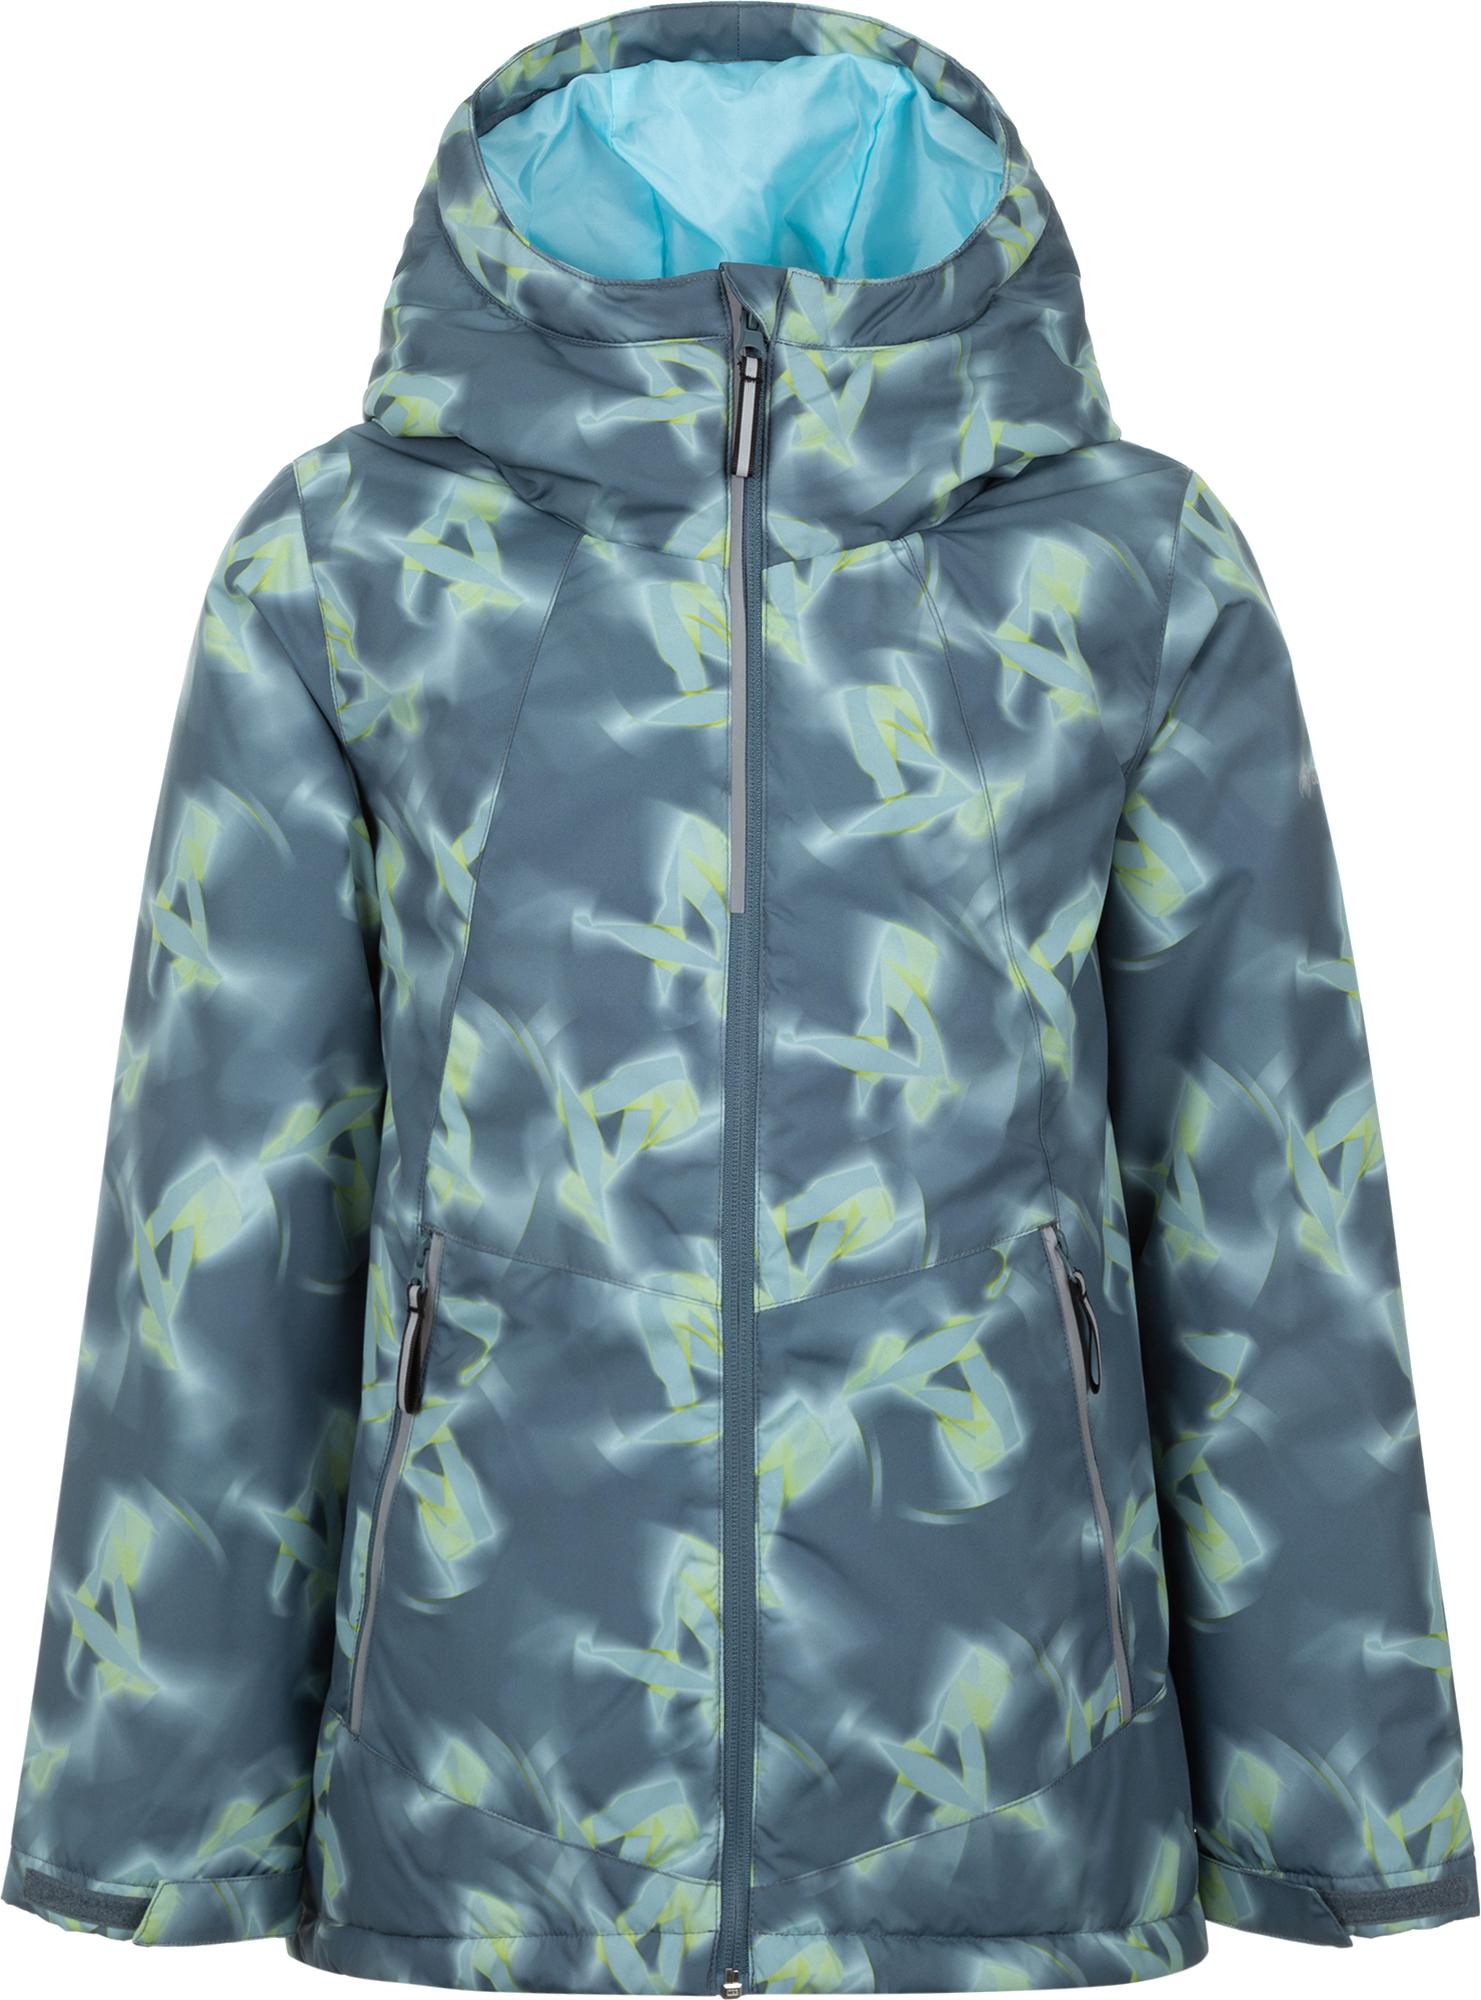 Outventure Куртка утепленная для девочек Outventure, размер 146